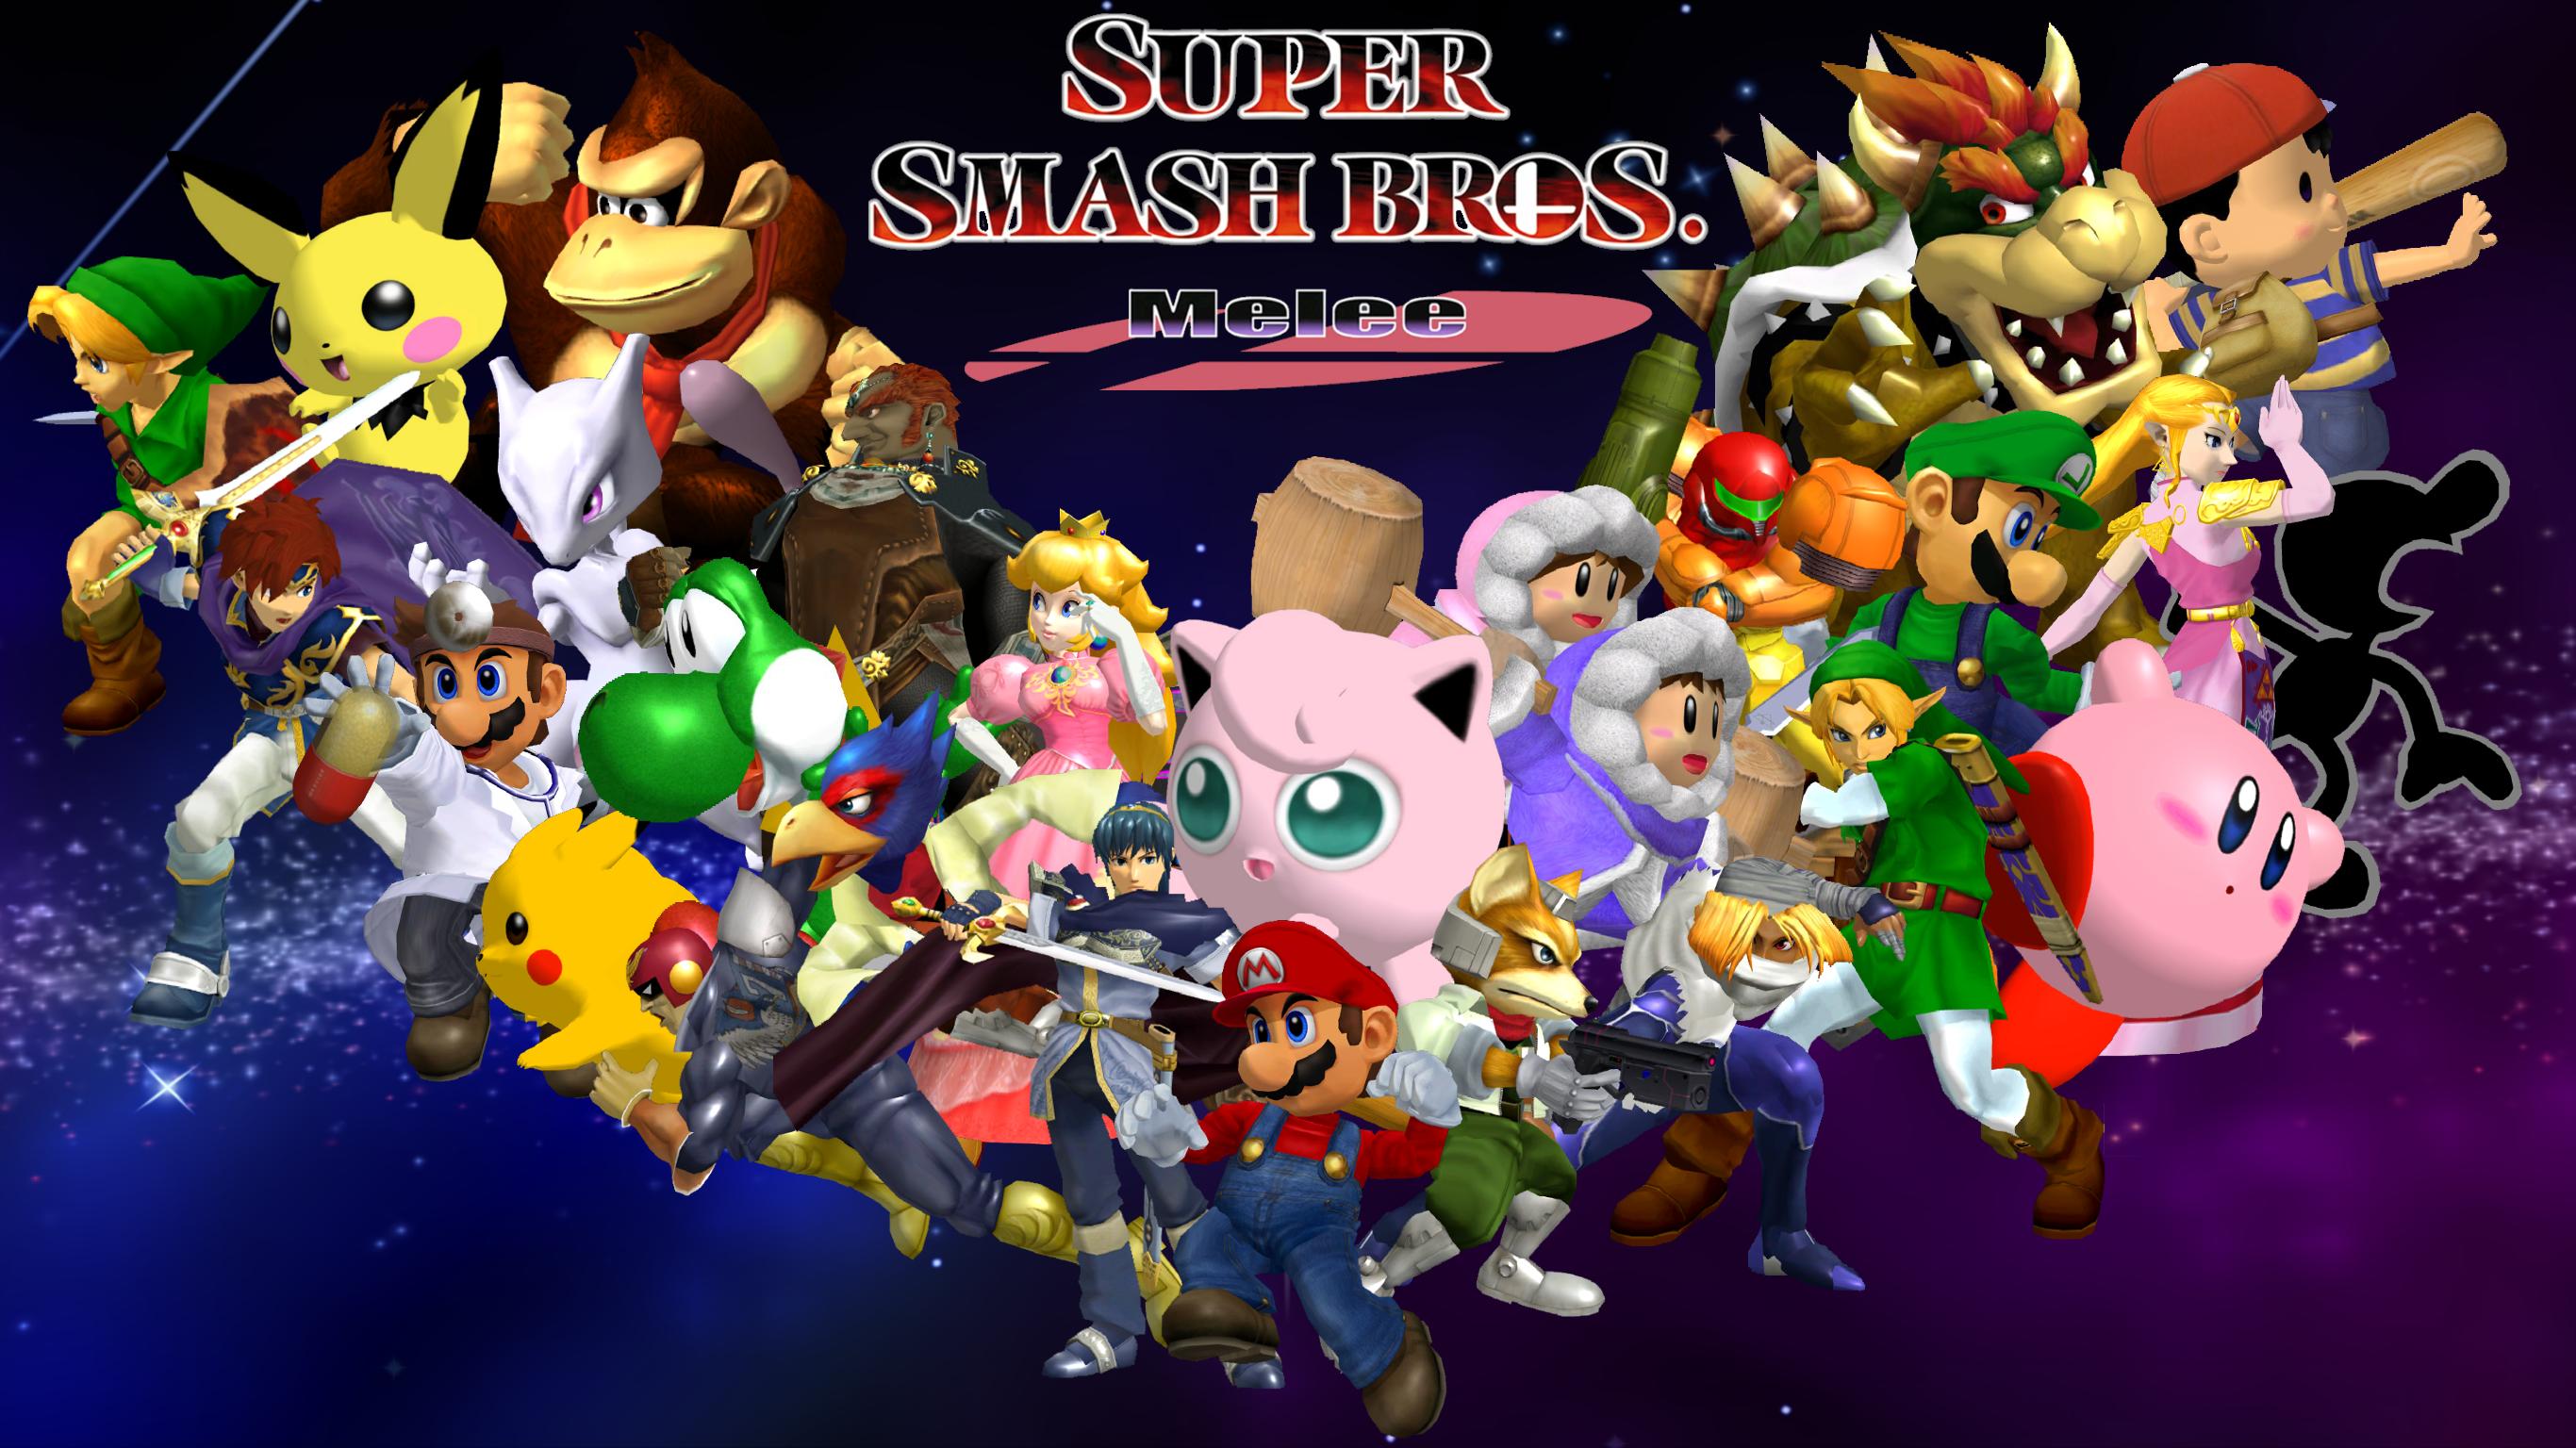 super smash bros melee wallpaper by game34rules on deviantart